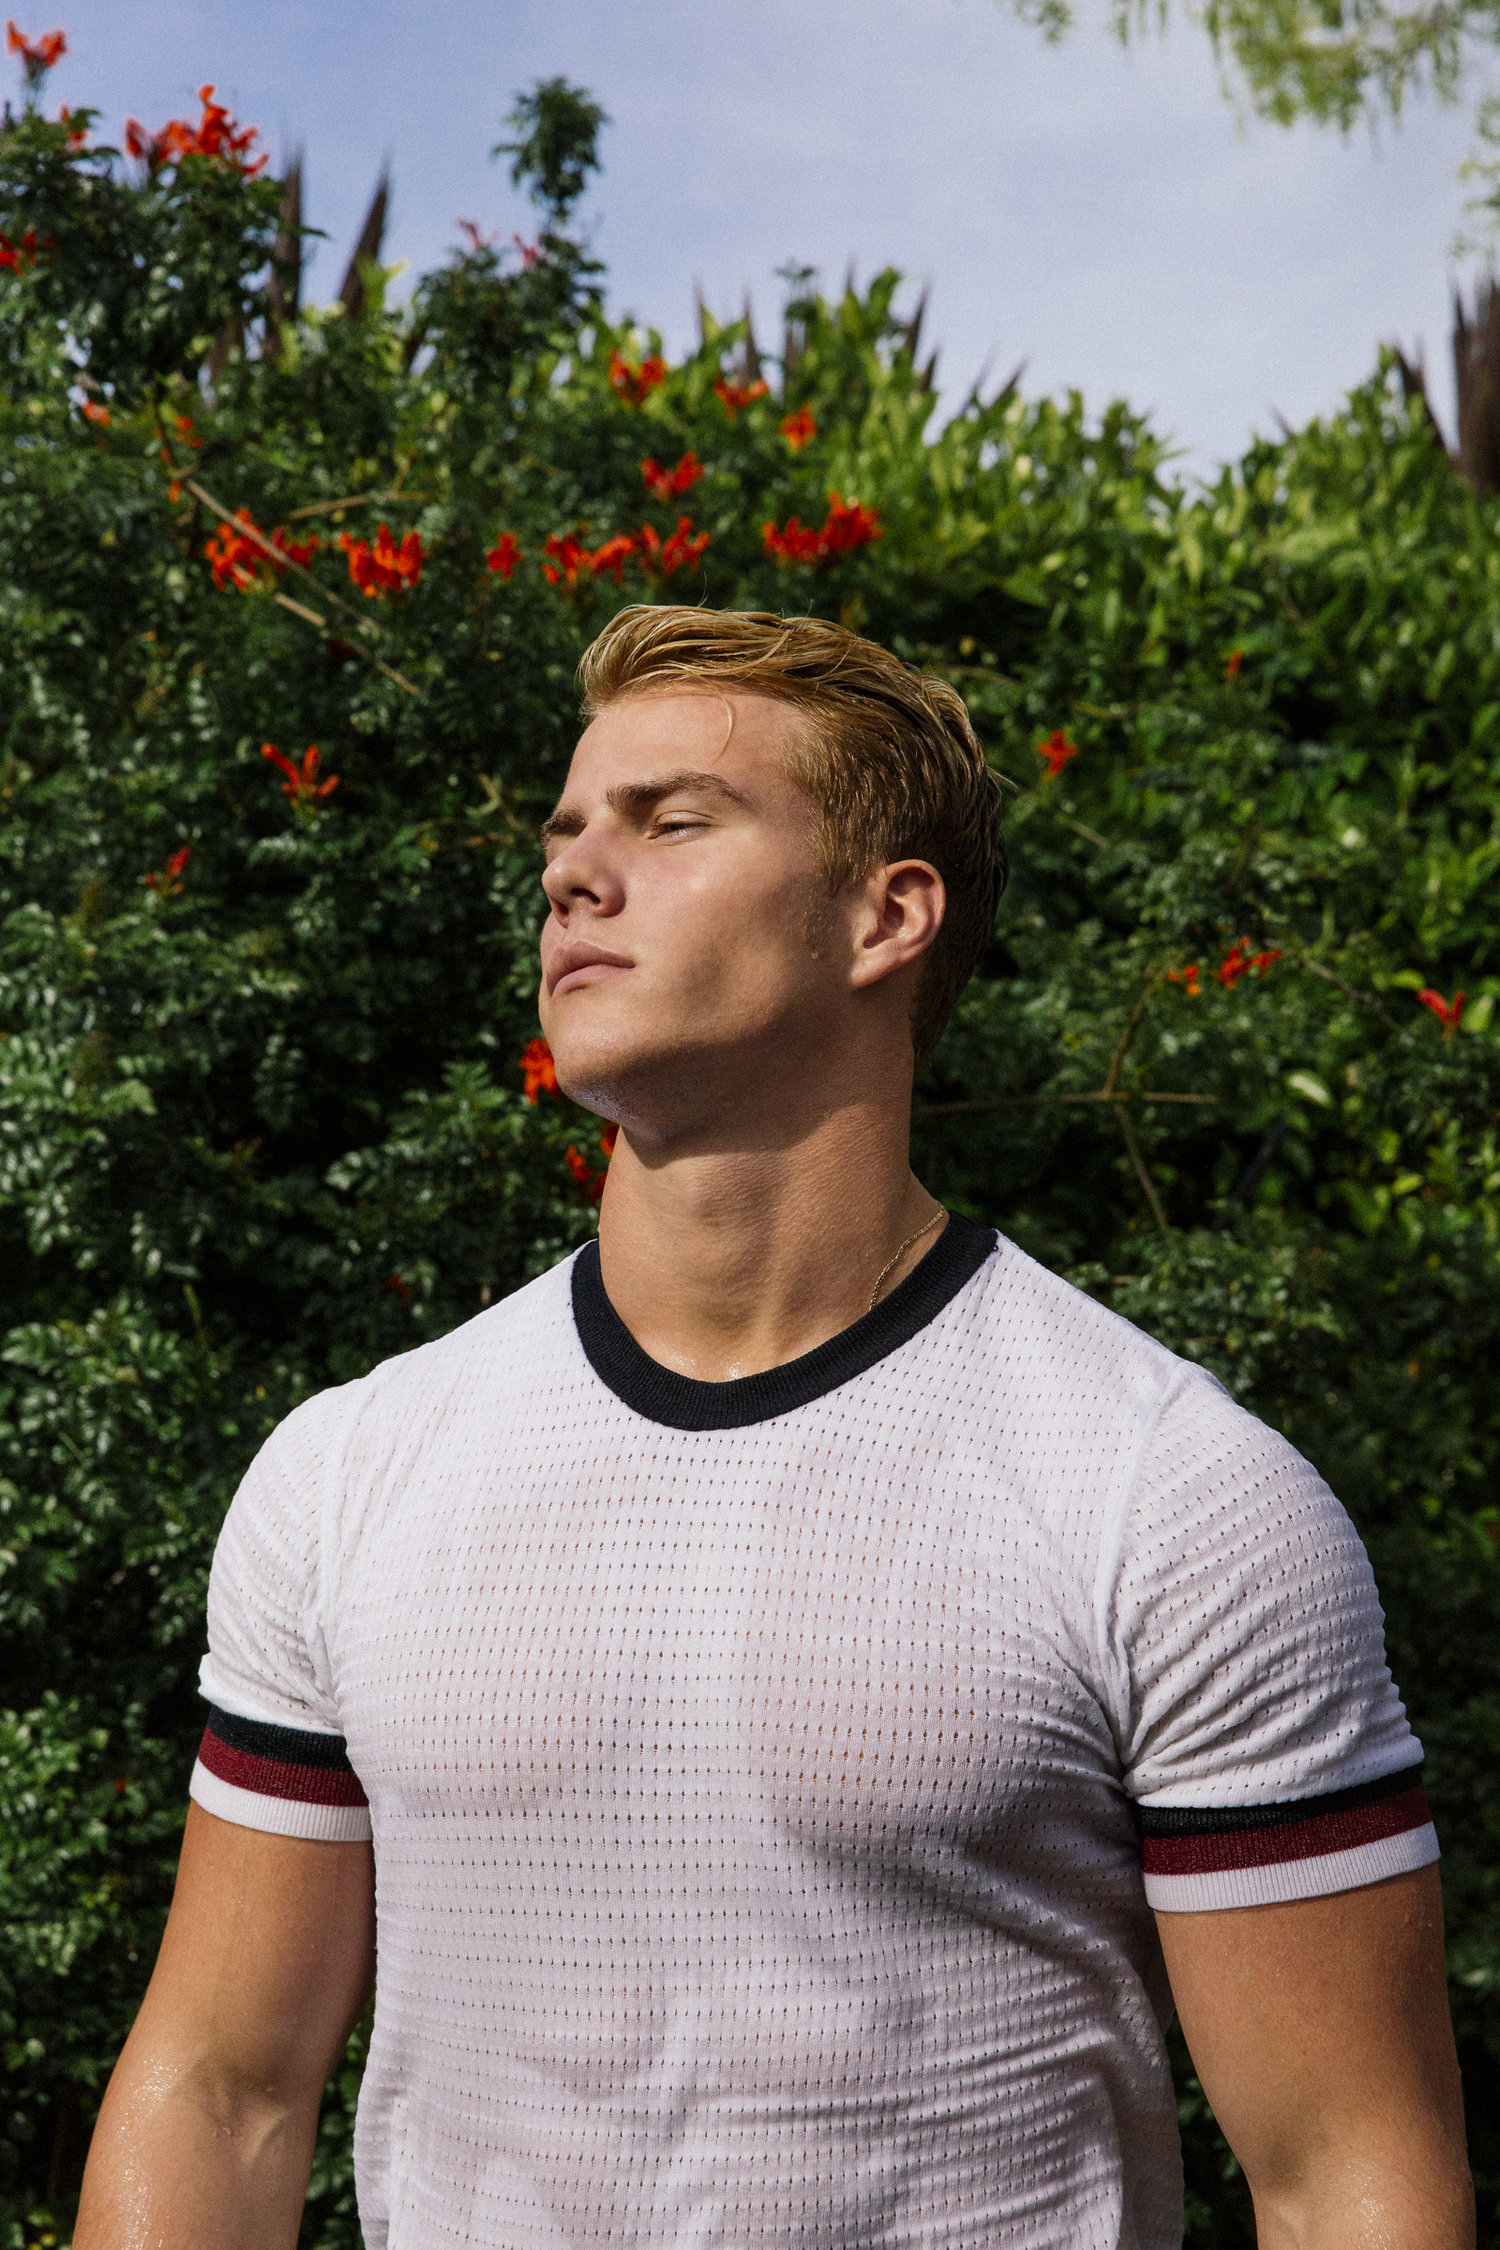 Adon Exclusive: Model  Michael Dean By Gabe Ayala